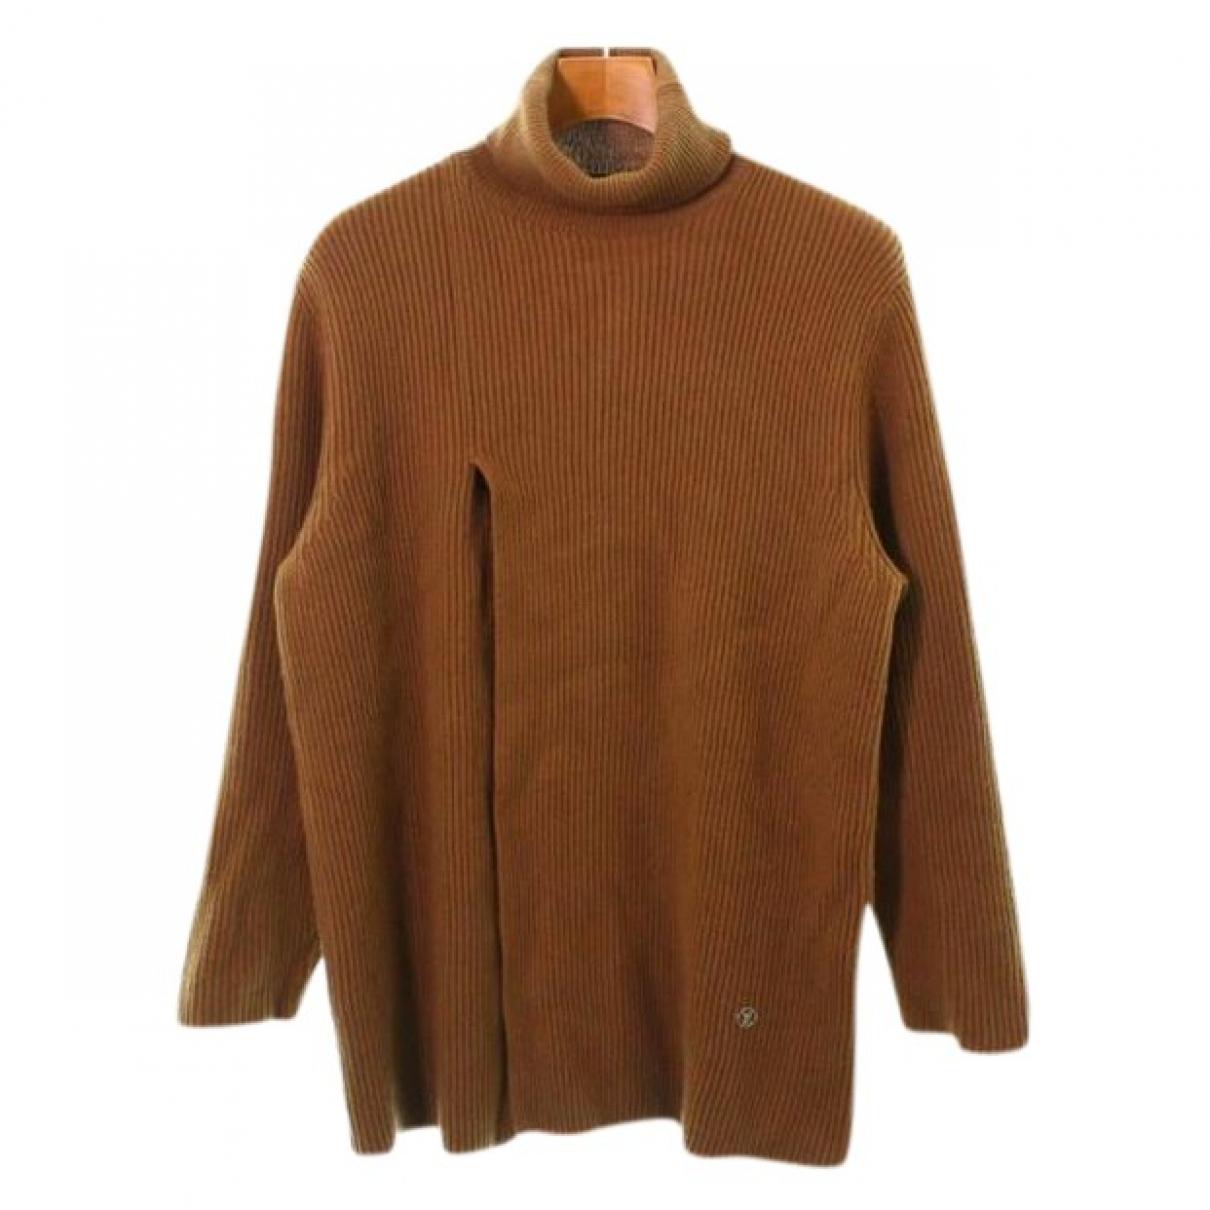 Louis Vuitton \N Camel Cashmere Knitwear & Sweatshirts for Men L International